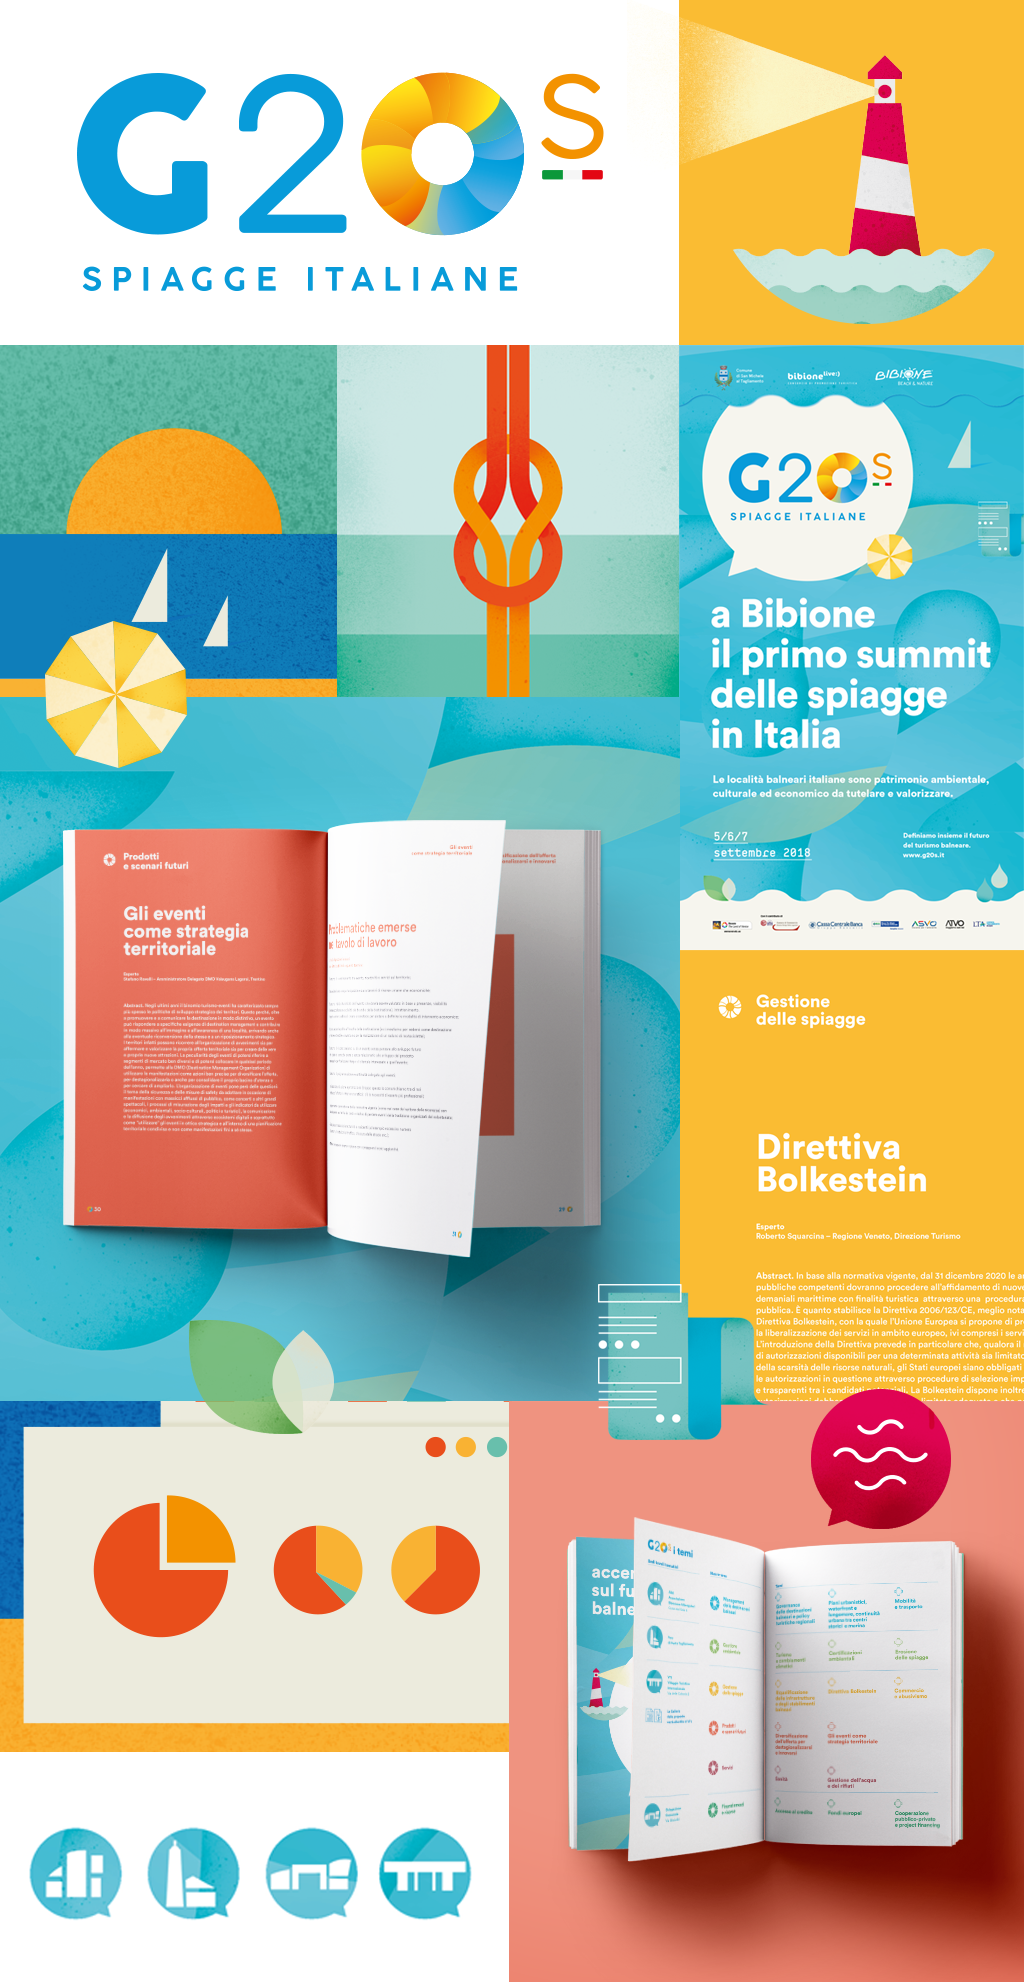 G20s-insieme-grafica